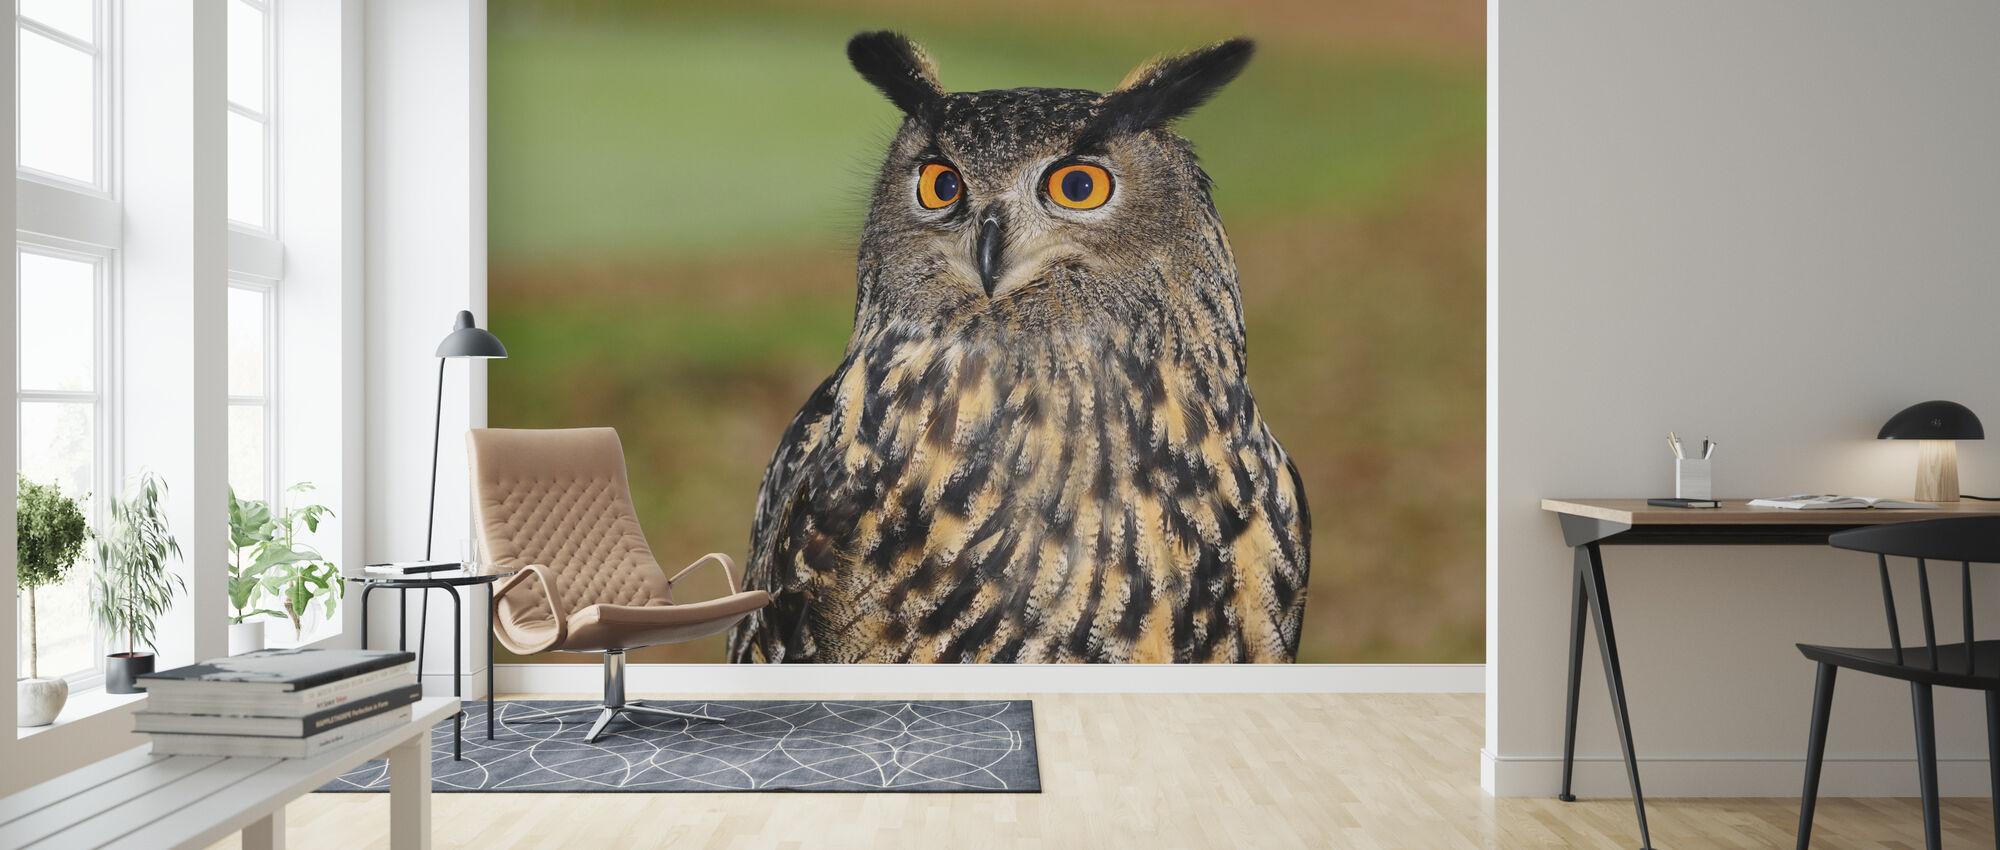 European Eagle Owl - Wallpaper - Living Room